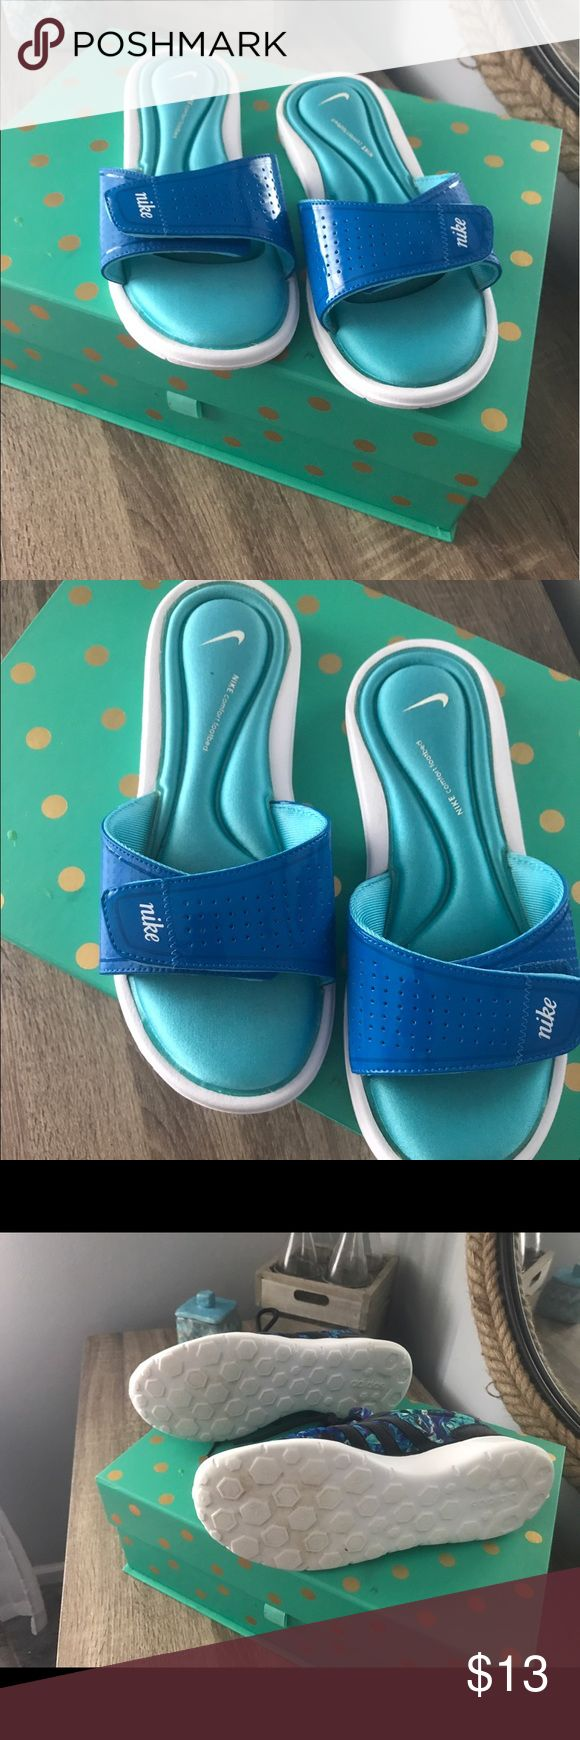 Nike memory foam sandals Nike aqua blue memory foam flip flops.  Size 8 Nike Shoes Sandals